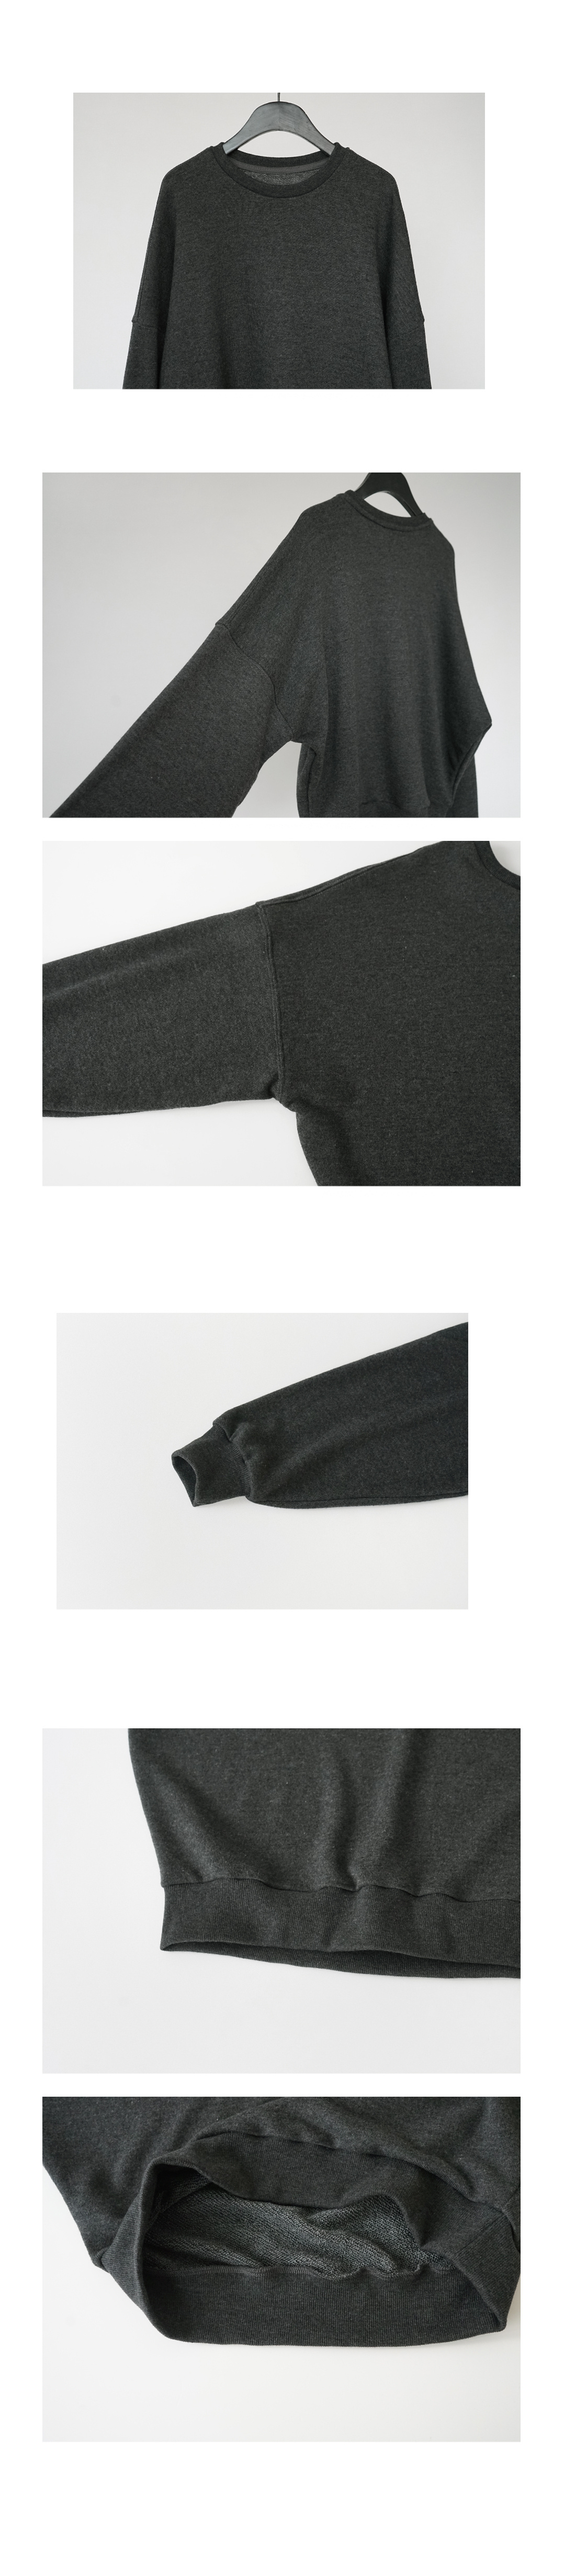 cozy mood regular sweatshirt (5colors)